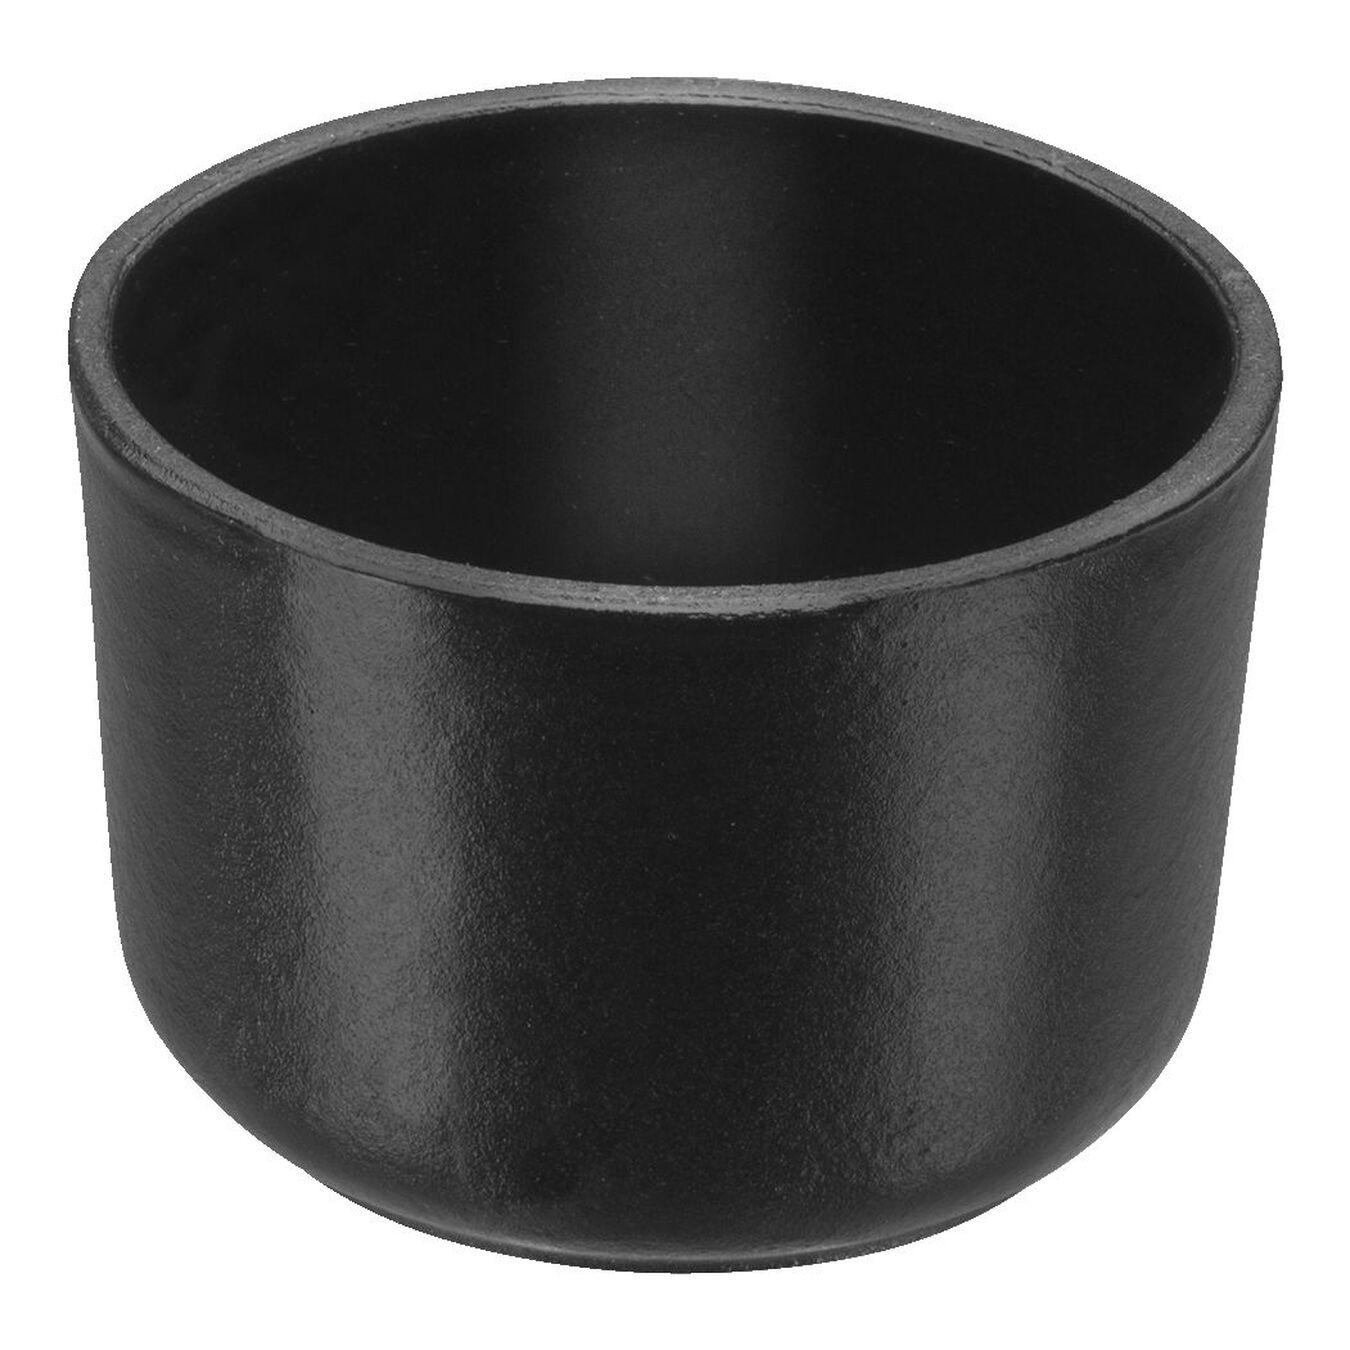 8 cm Cast iron Grinder, Black,,large 4